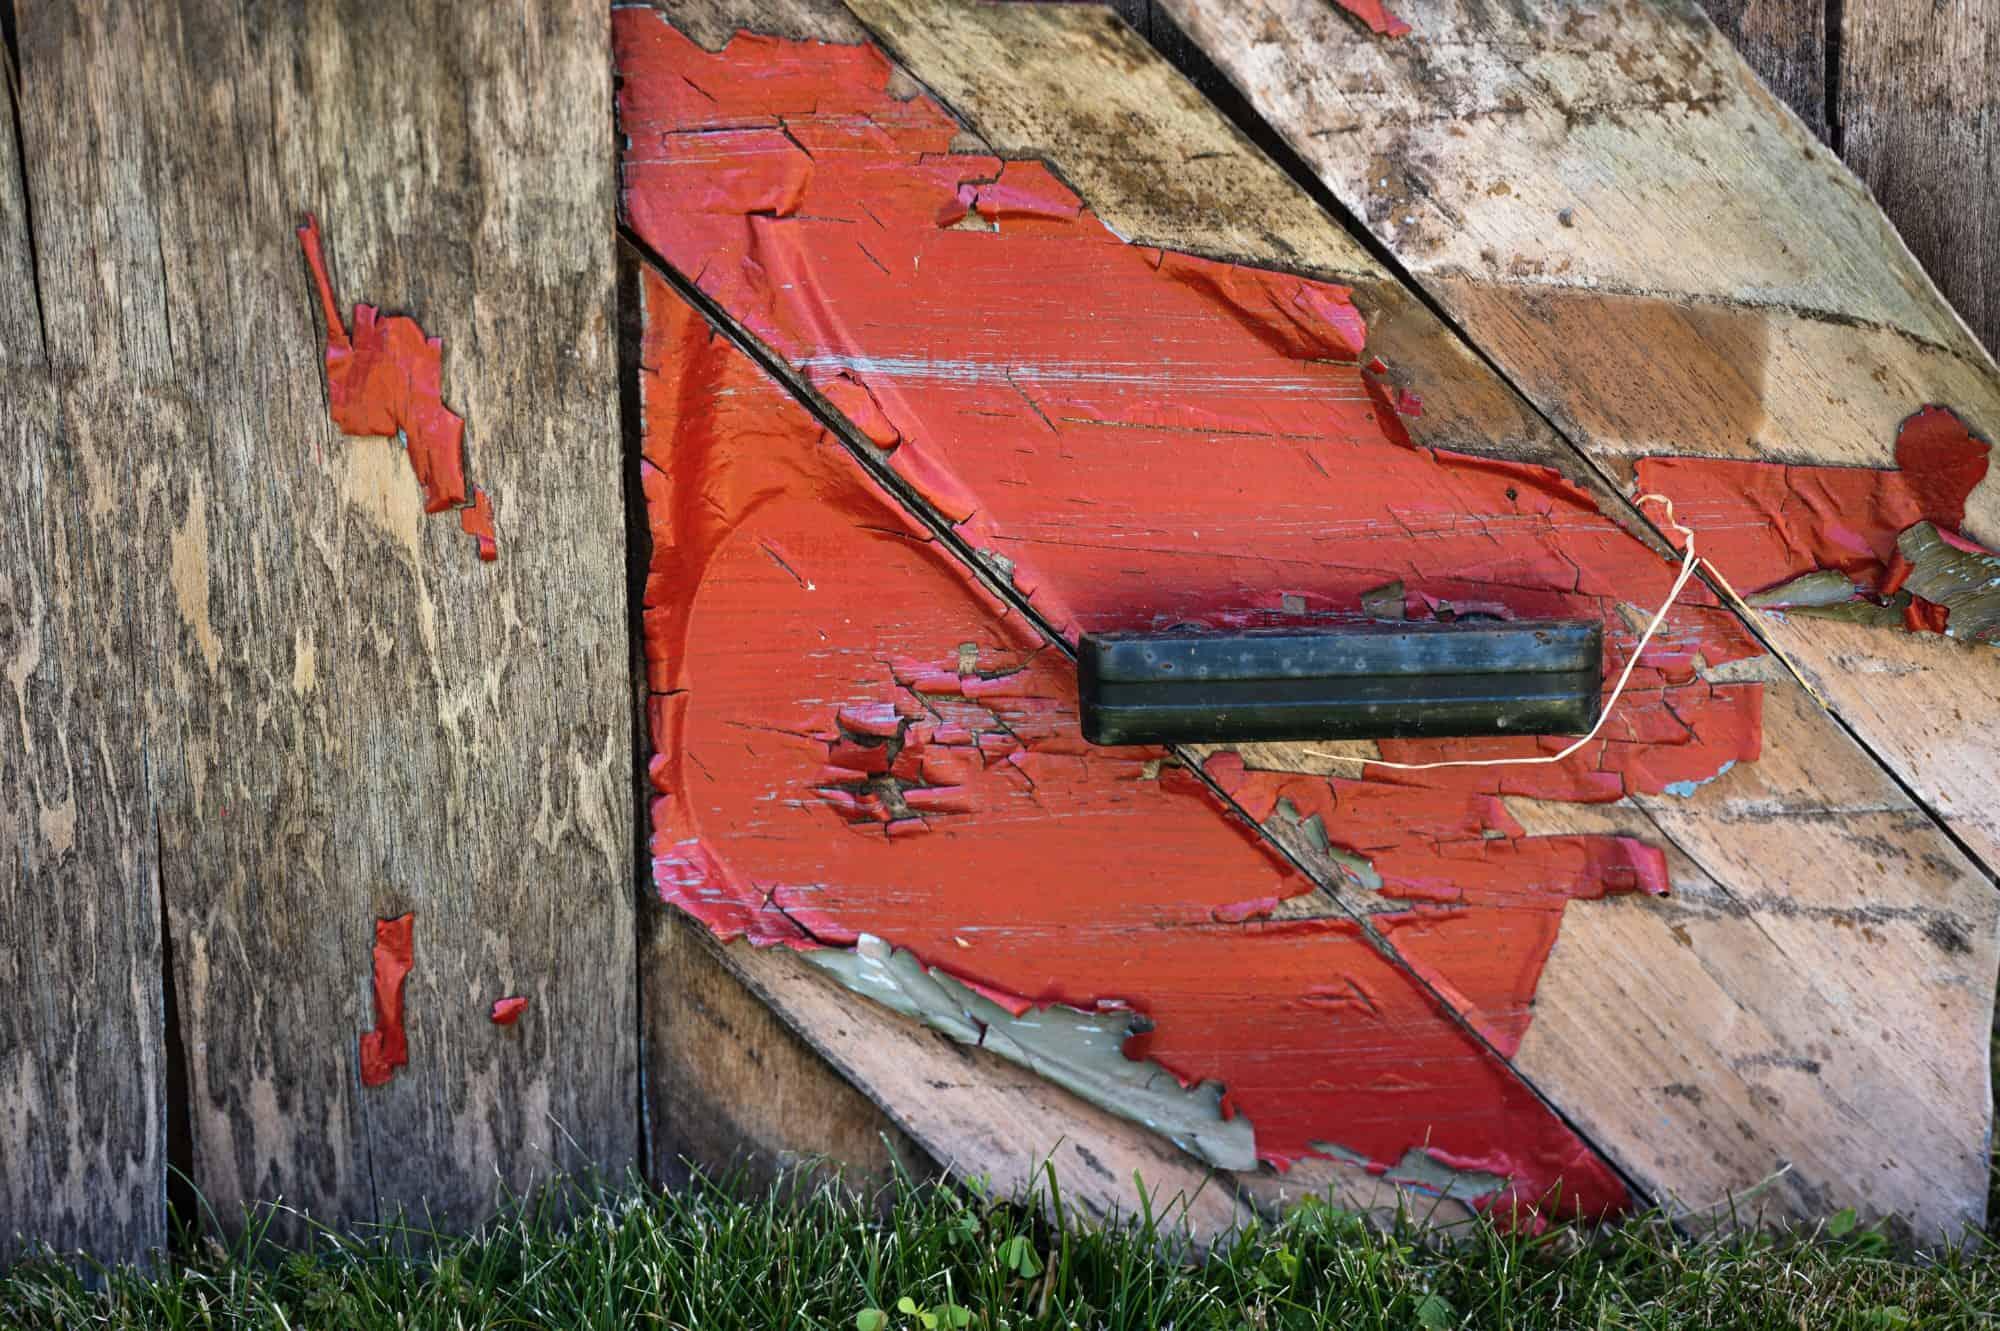 Rustic wooden corner with red paint splash